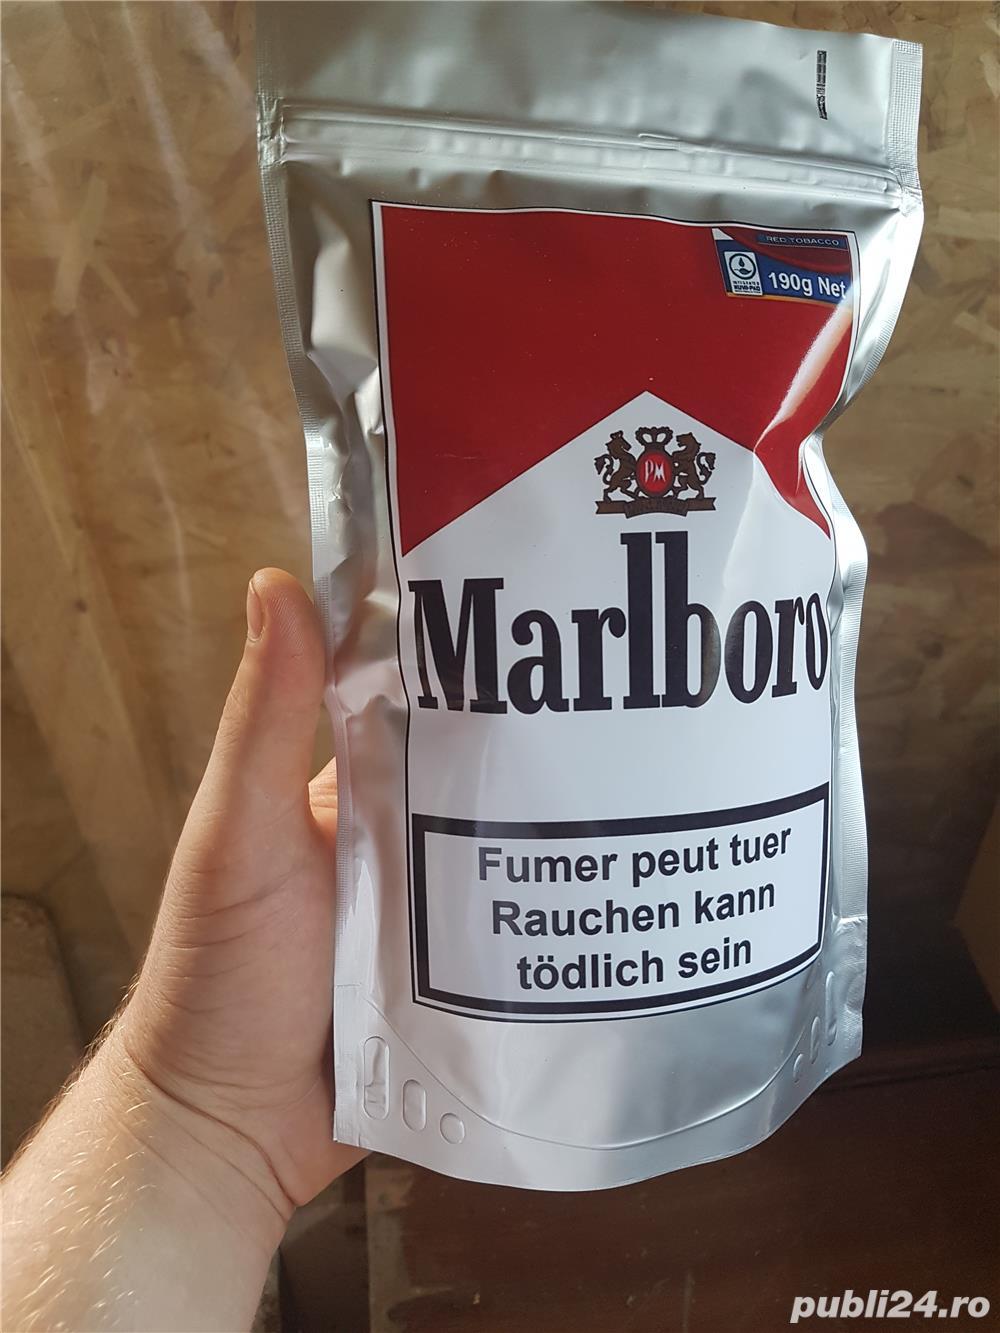 #Tutun Ambalat / Sigilat Marlboro - 190Gr - 50 lei ,pentru injectat/ rulat  ca drum, pueblo, tabac